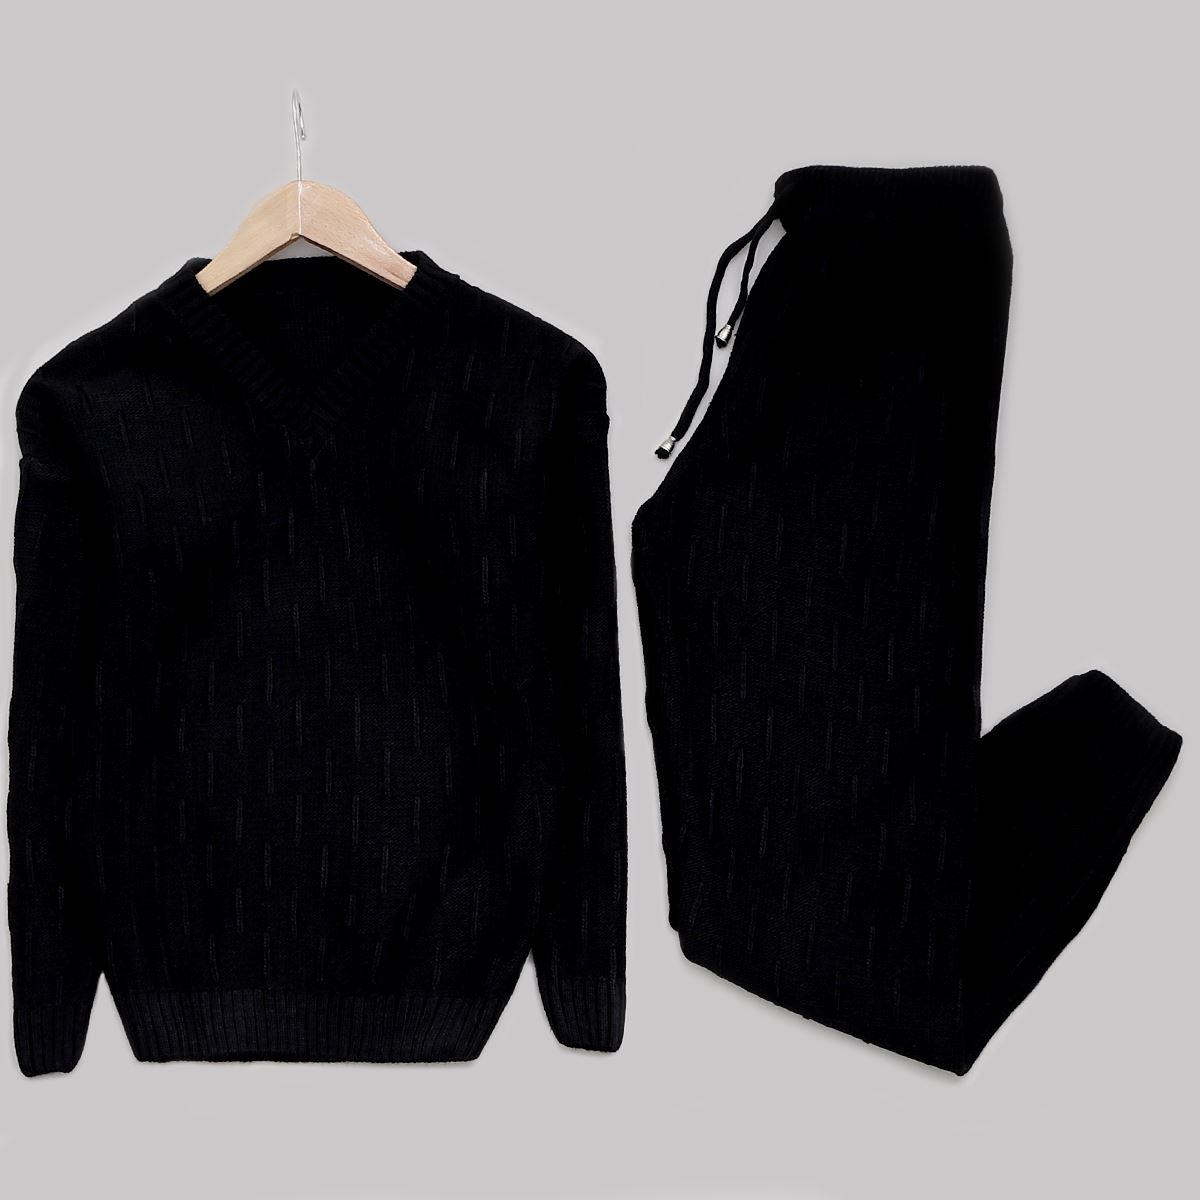 Siyah Triko Takım TKM1215